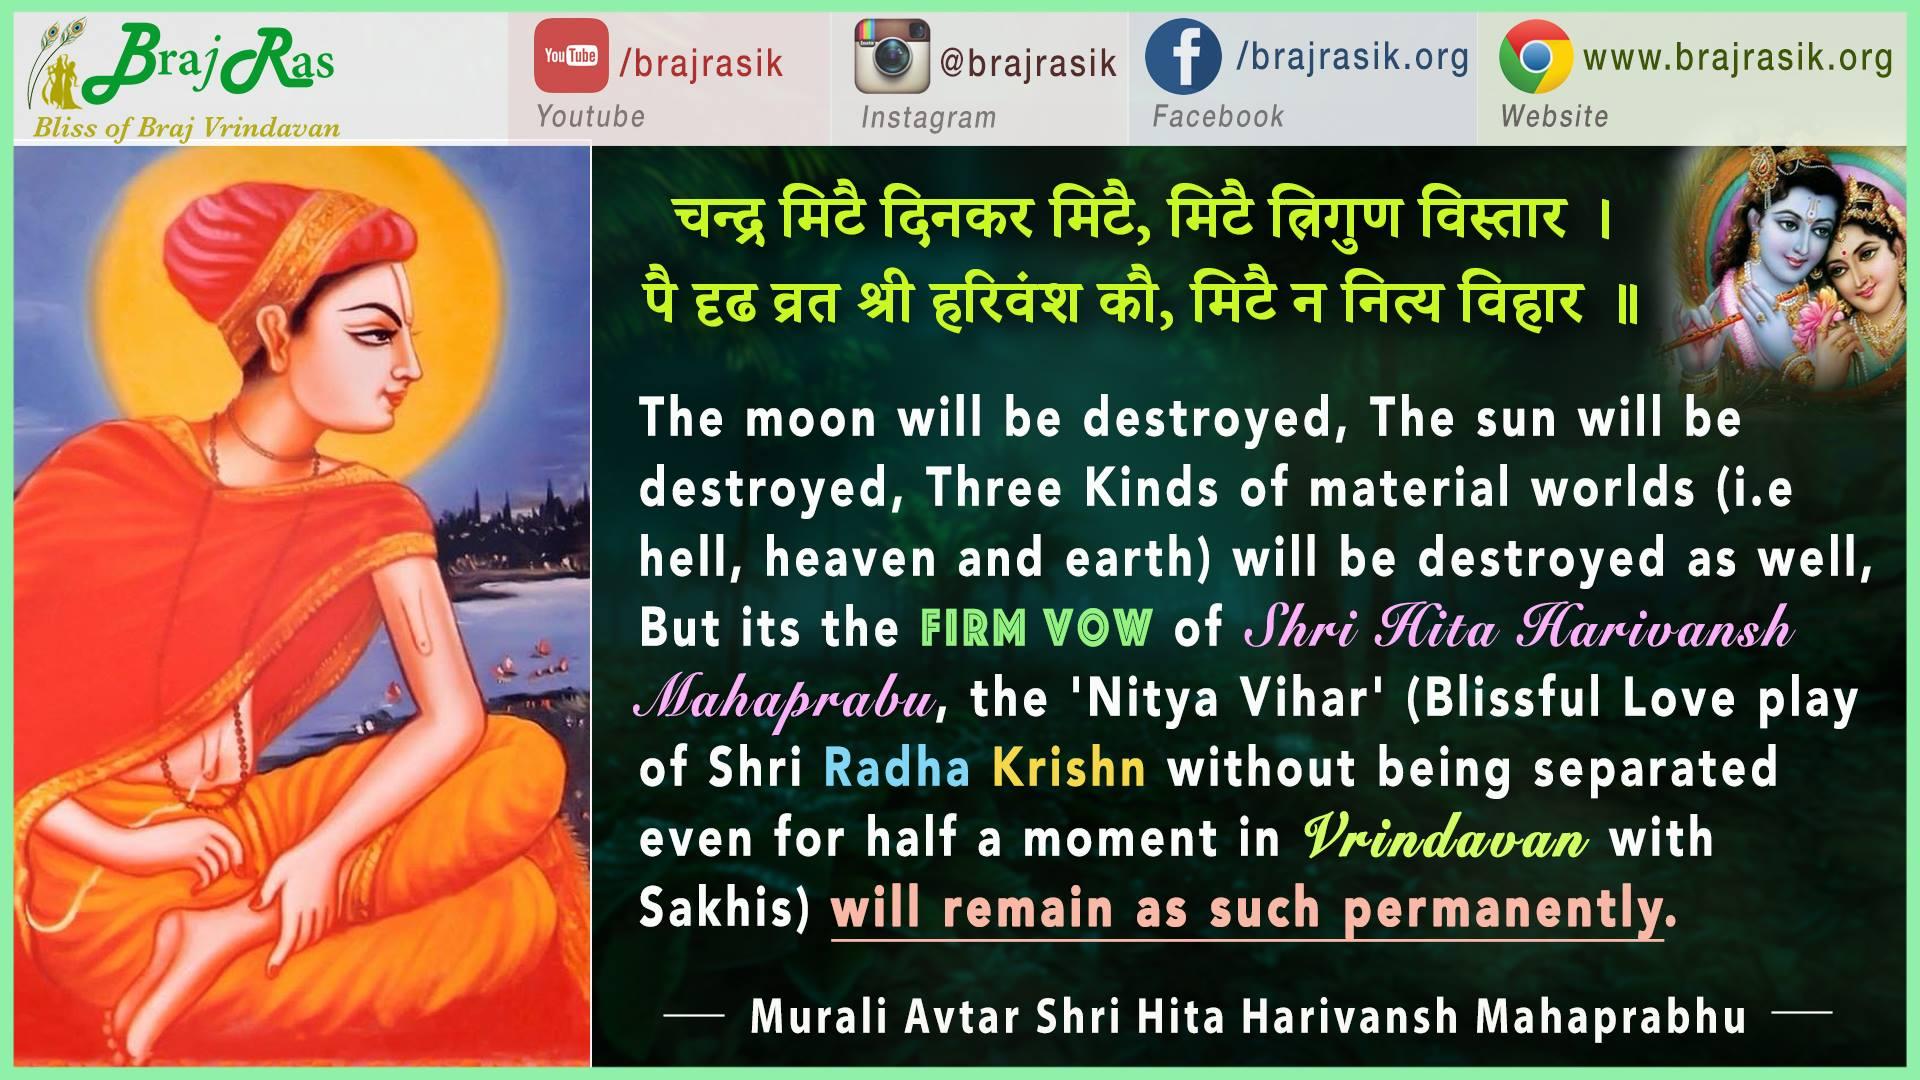 Chandra Mite Dinkar Mite, Mite Trigun Vistaar - Murali Avtar Shri Hita Harivansh Mahaprabhu